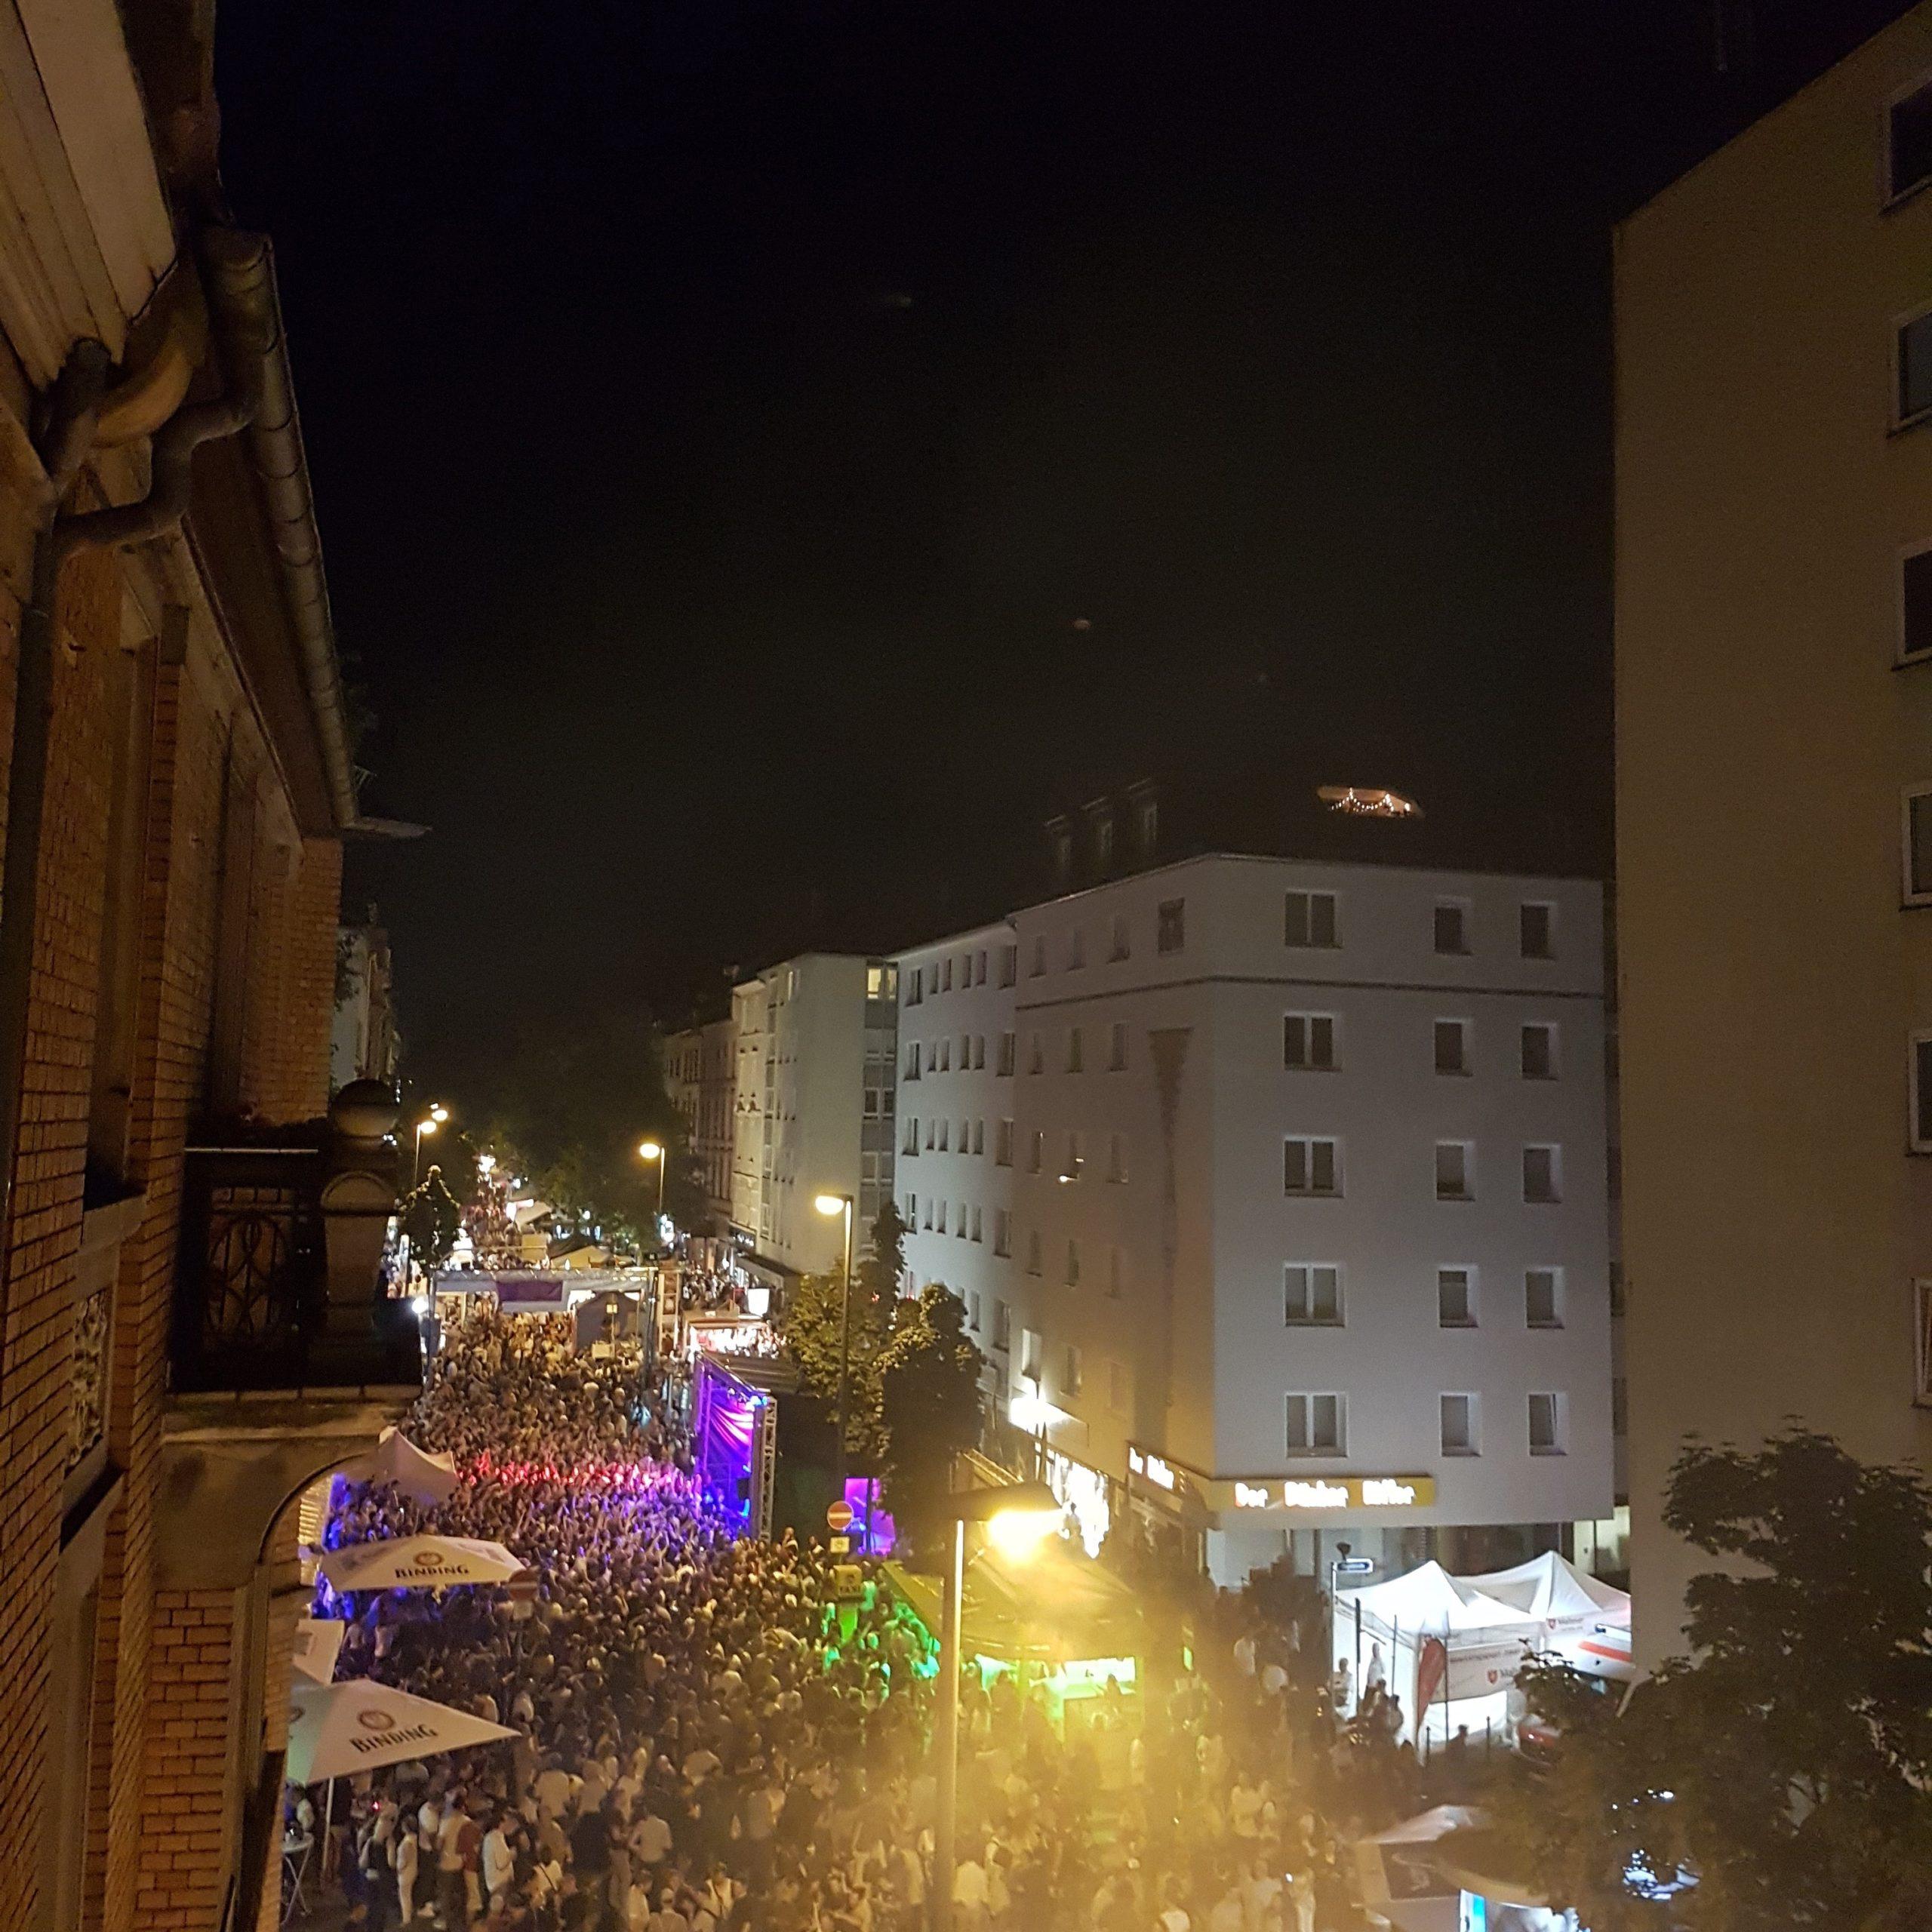 Berger Strassenfest